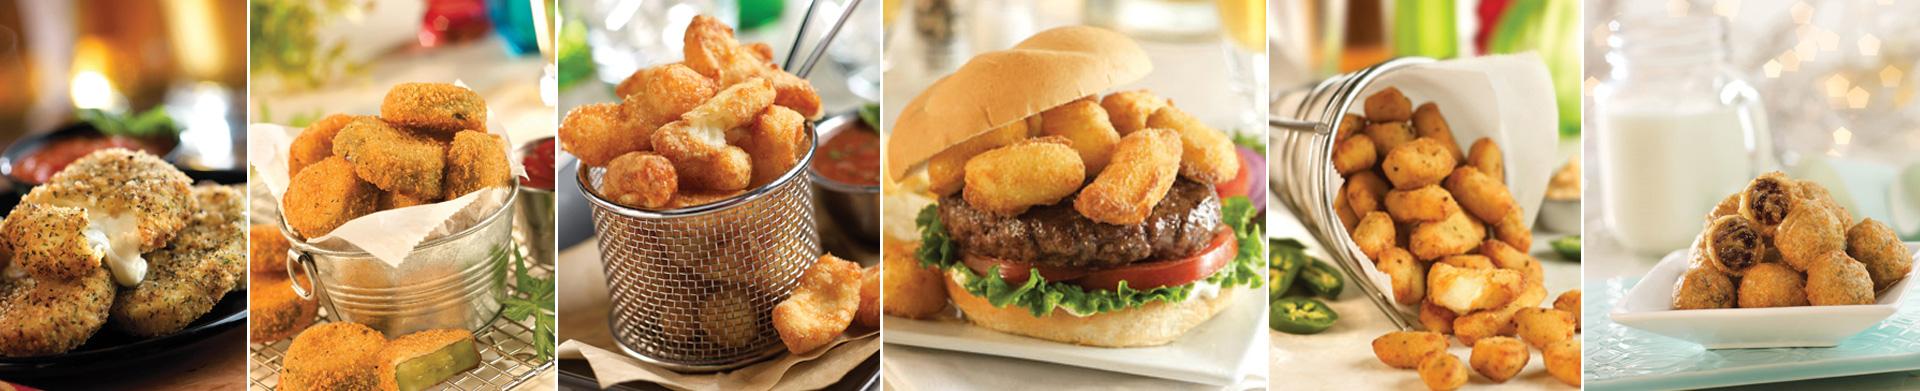 Fried-Foods